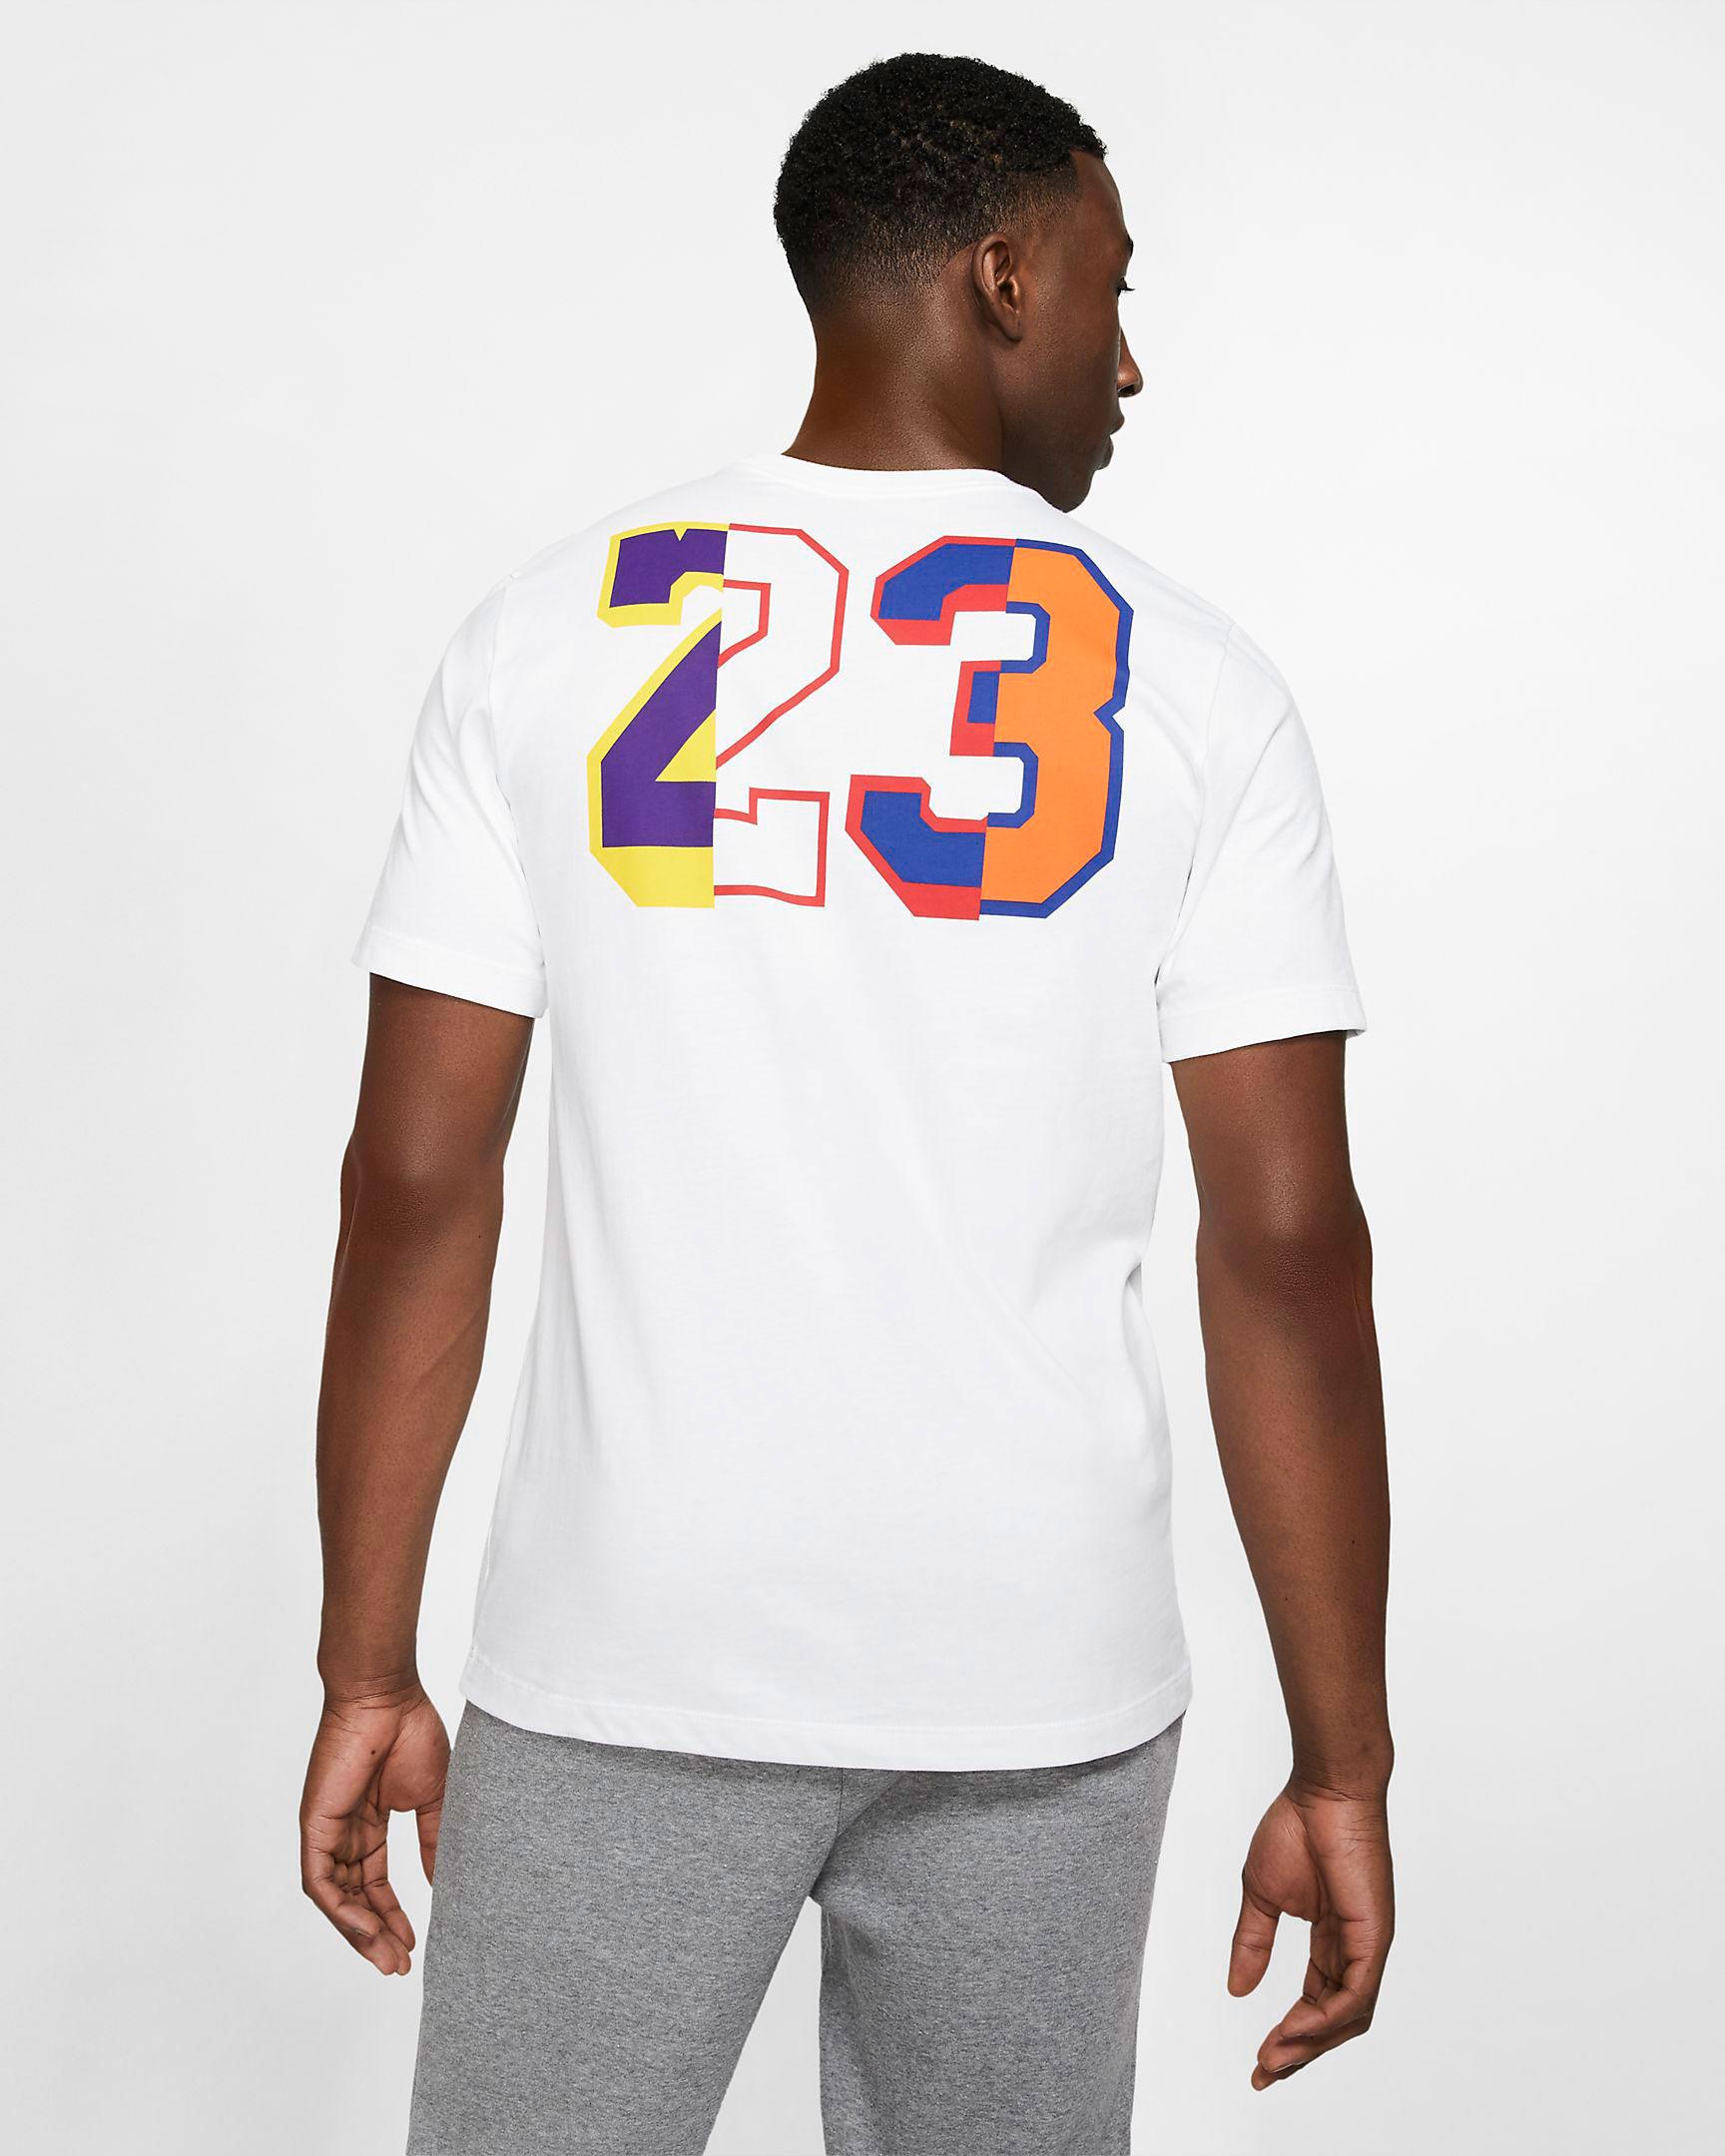 lakers-jordan-13-rivals-tee-shirt-white-2